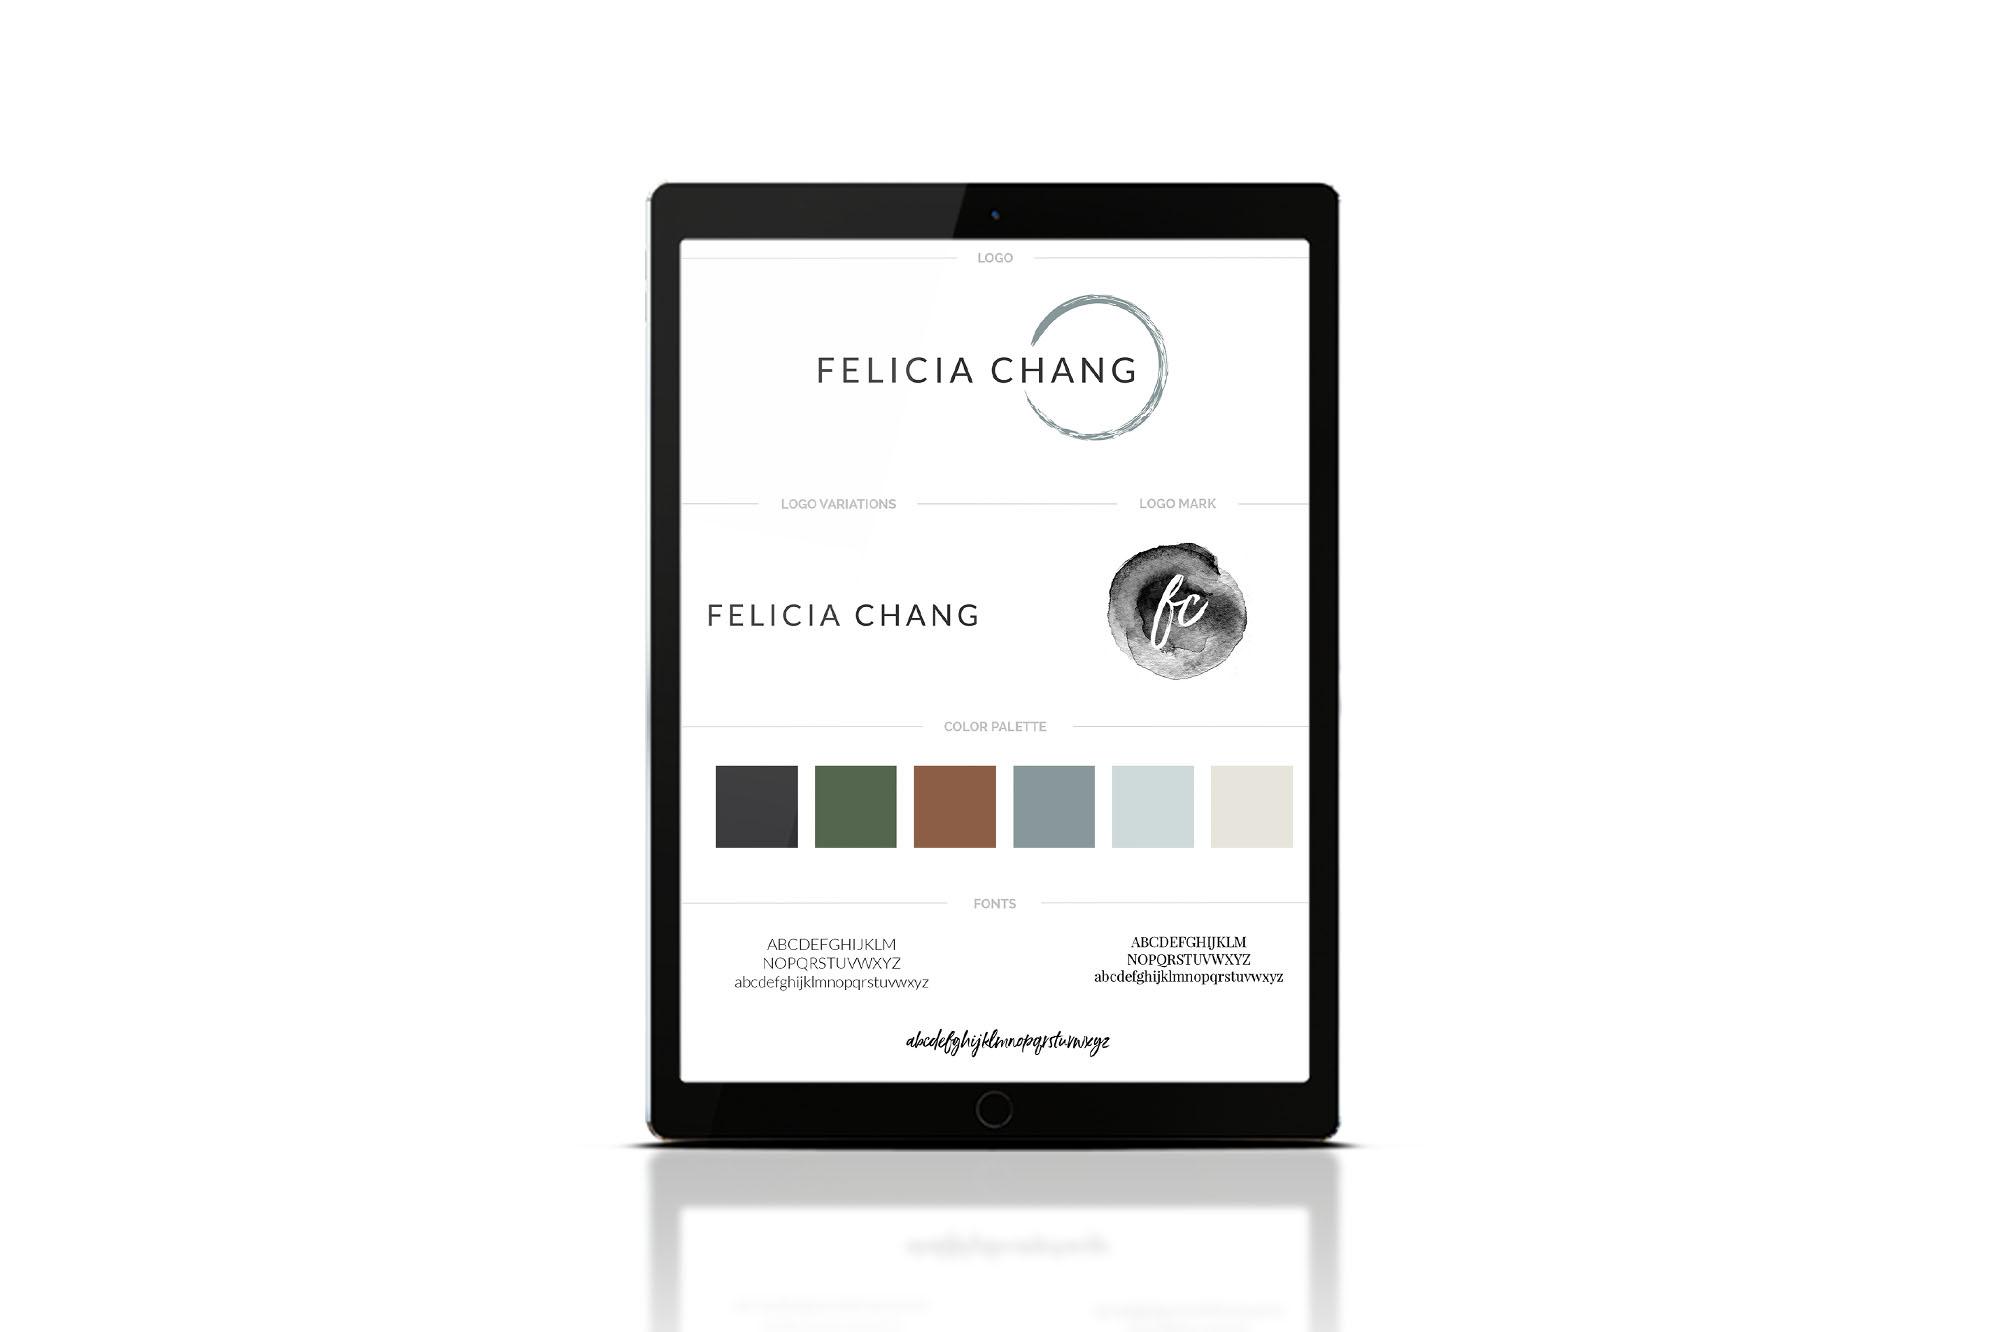 Felicia-Chang-Branding-Board.jpg